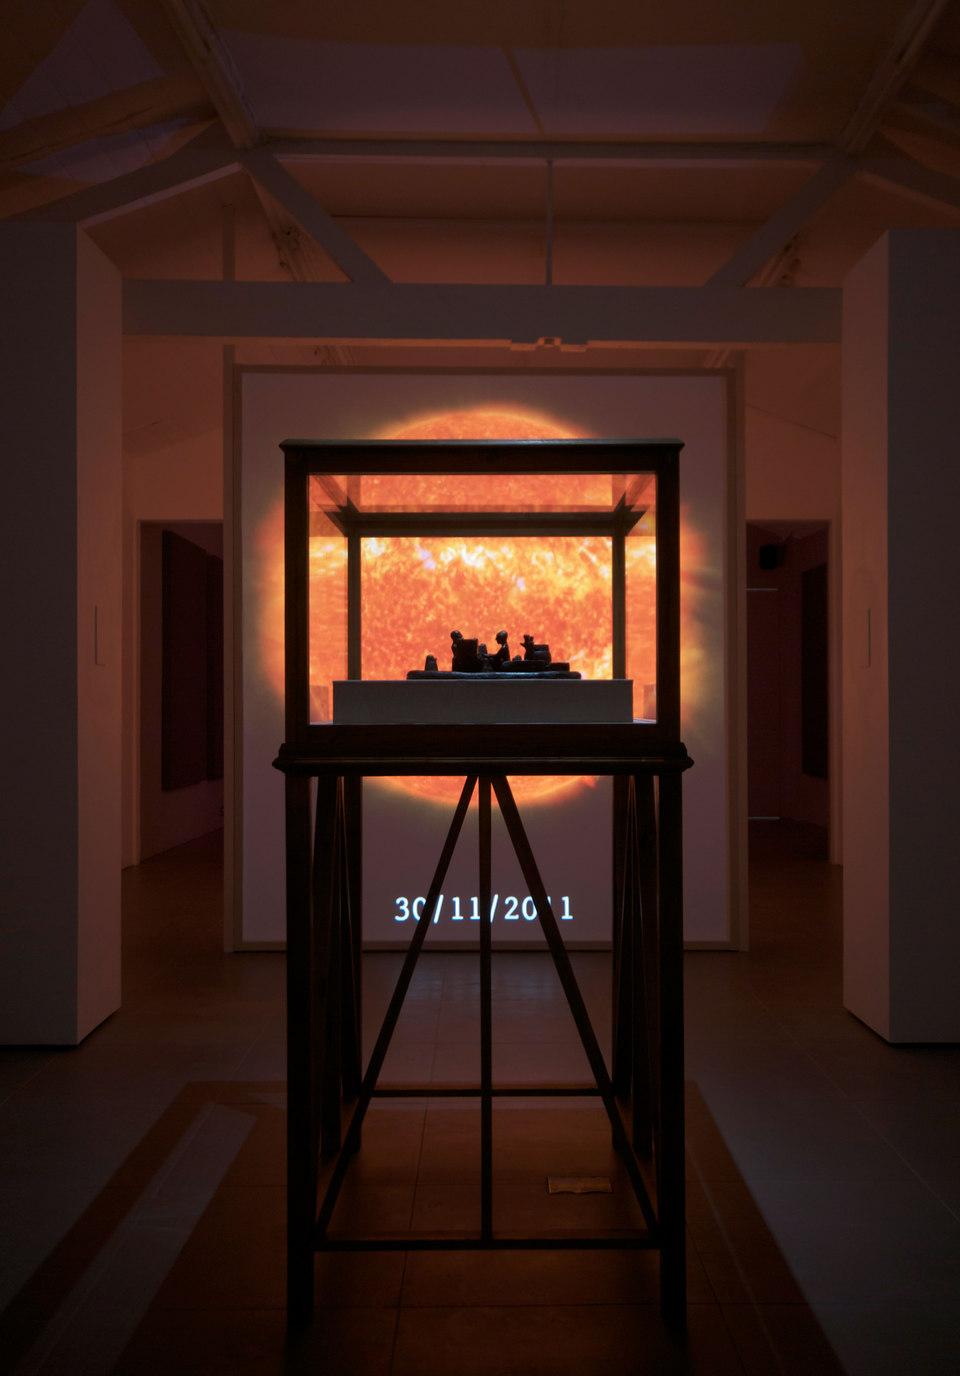 SO-LA, 2012, digital video, duration variable, 'Reconstruction of a 12th century BC Elamite antiquity, Sit Shamsi', 2012, bronze,(w. 53 cm x h. 12 cm x d. 35 cm) with 'Vitrine', 2012, timber, acrylic, linen, (w. 100 cm x h. 165 cm x d. 79 cm)